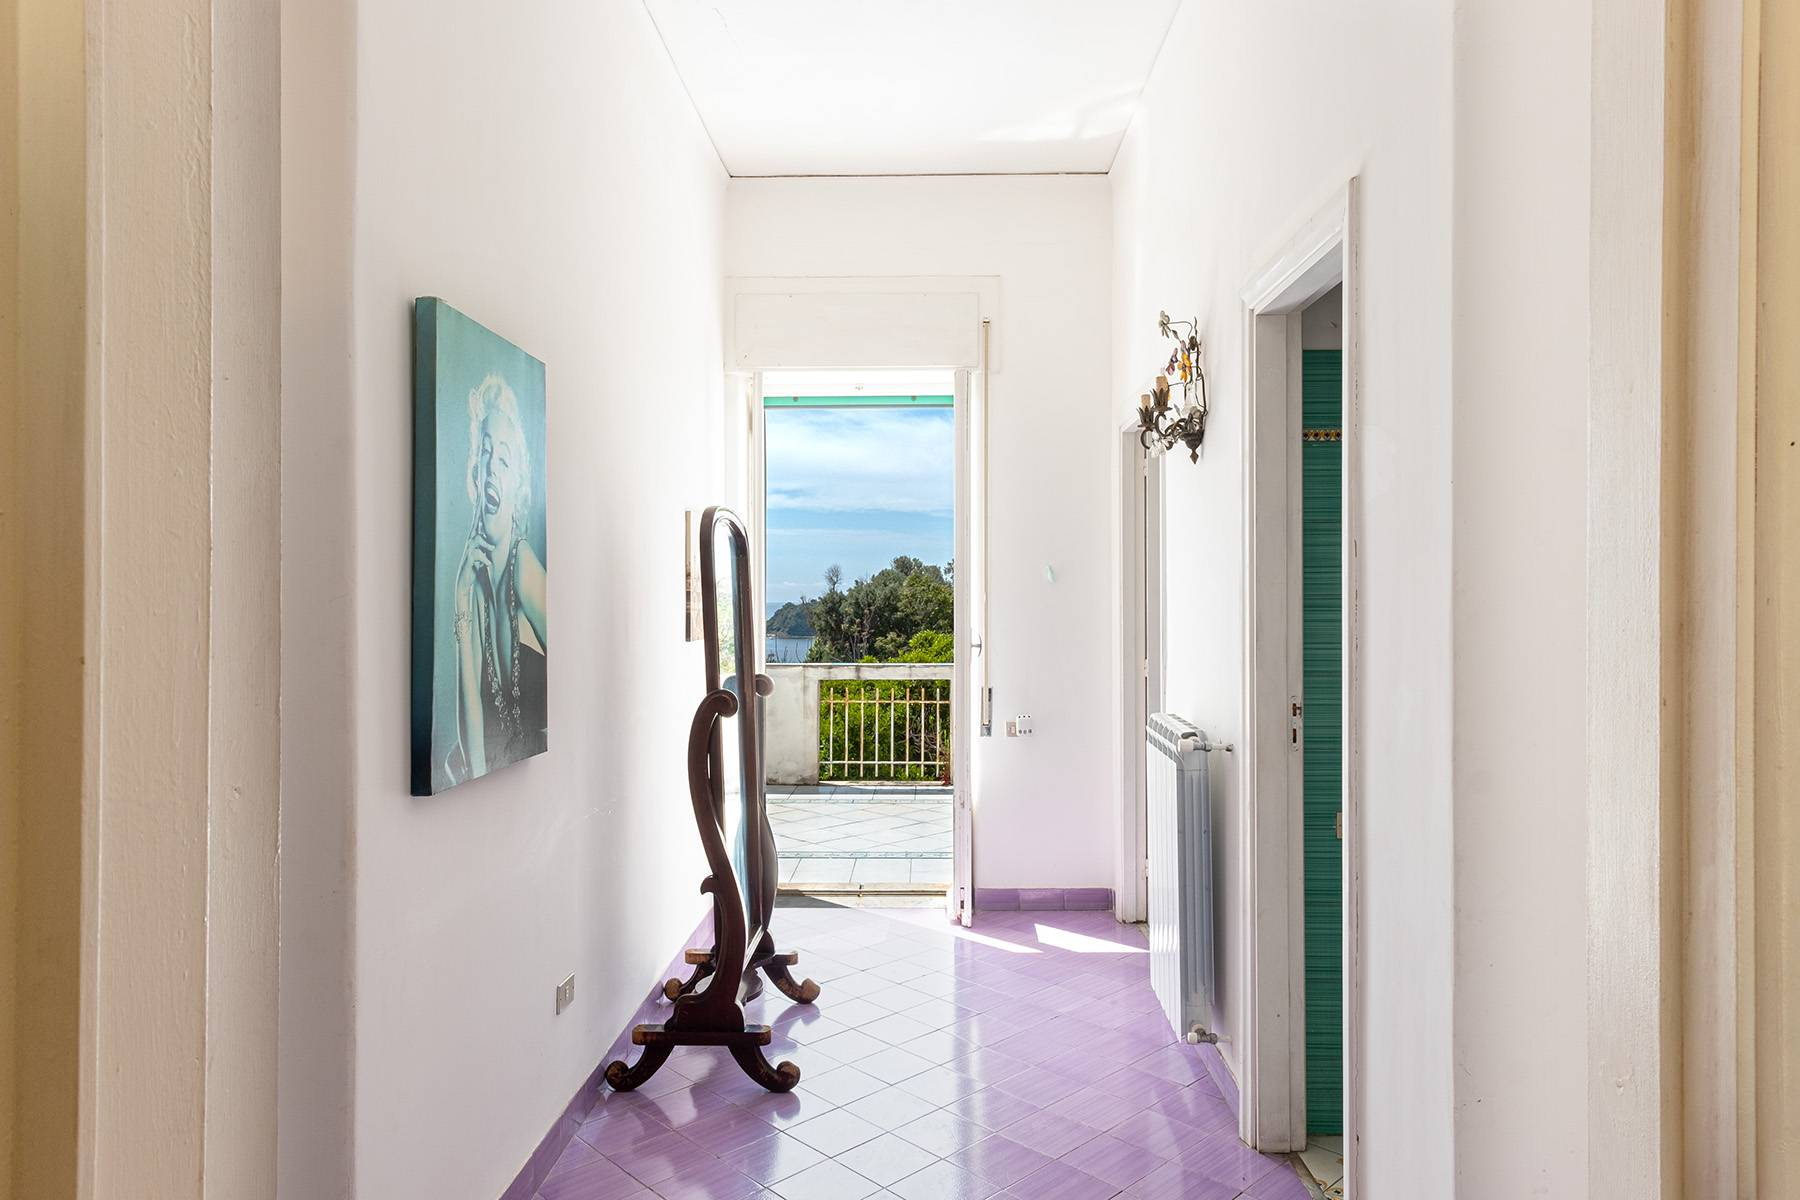 Casa indipendente in Vendita a Procida: 5 locali, 300 mq - Foto 10